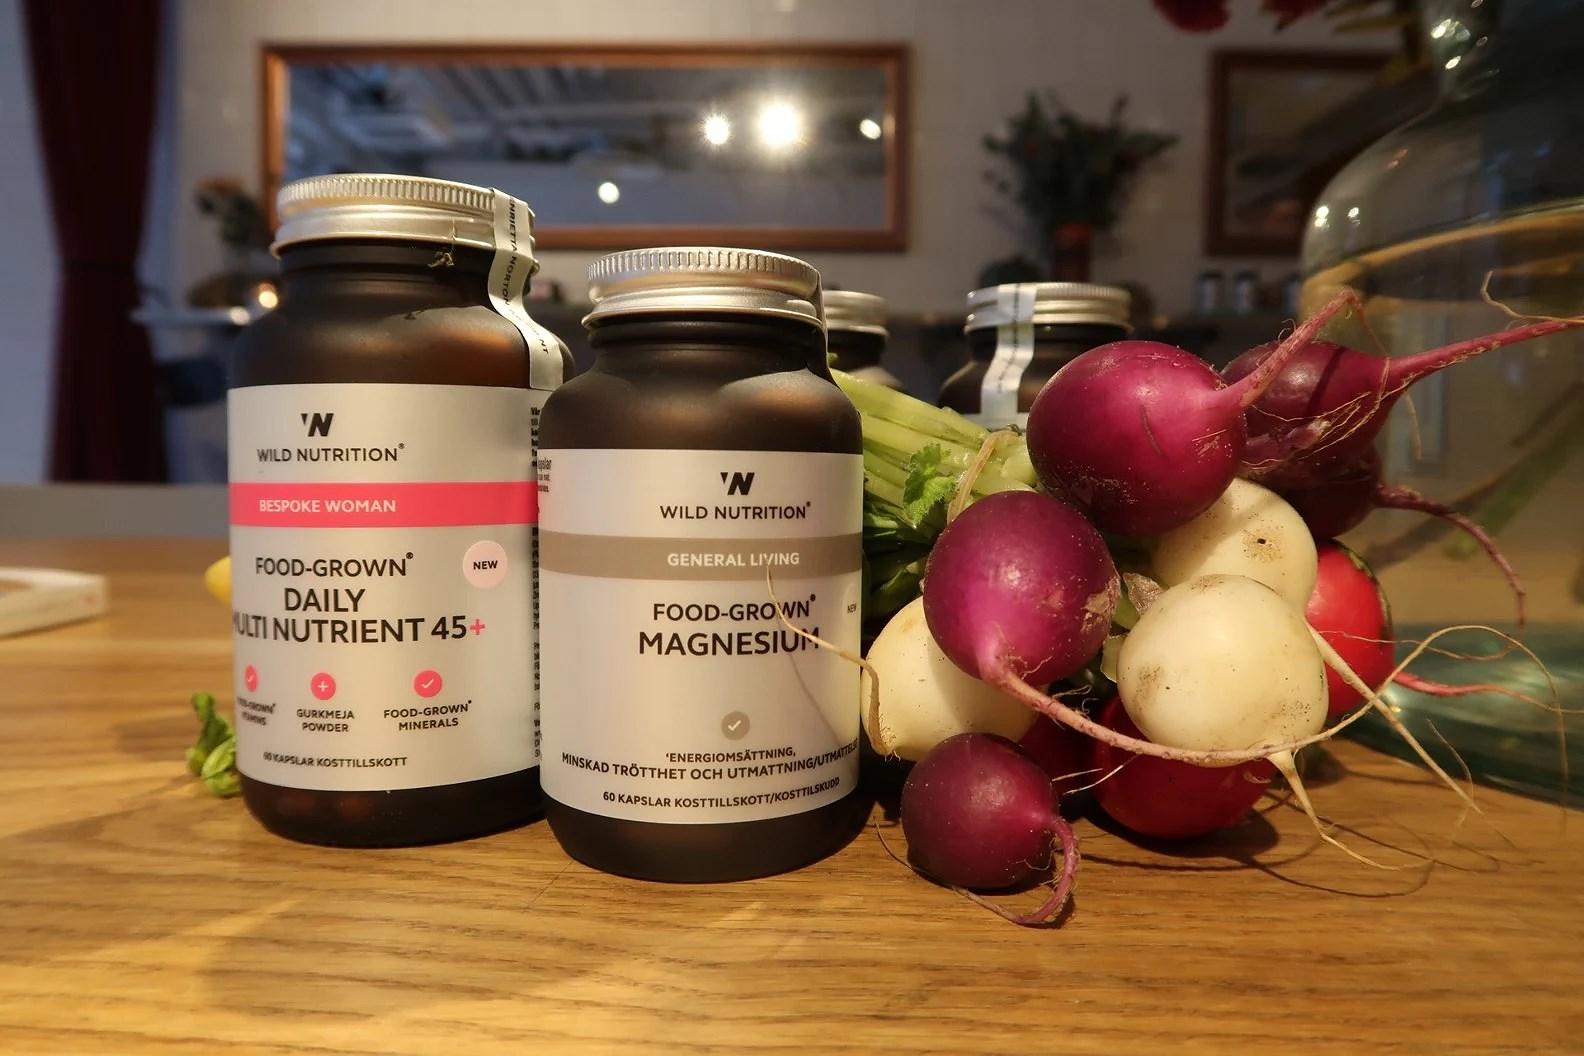 Wild nutrition lanseras i Sverige!